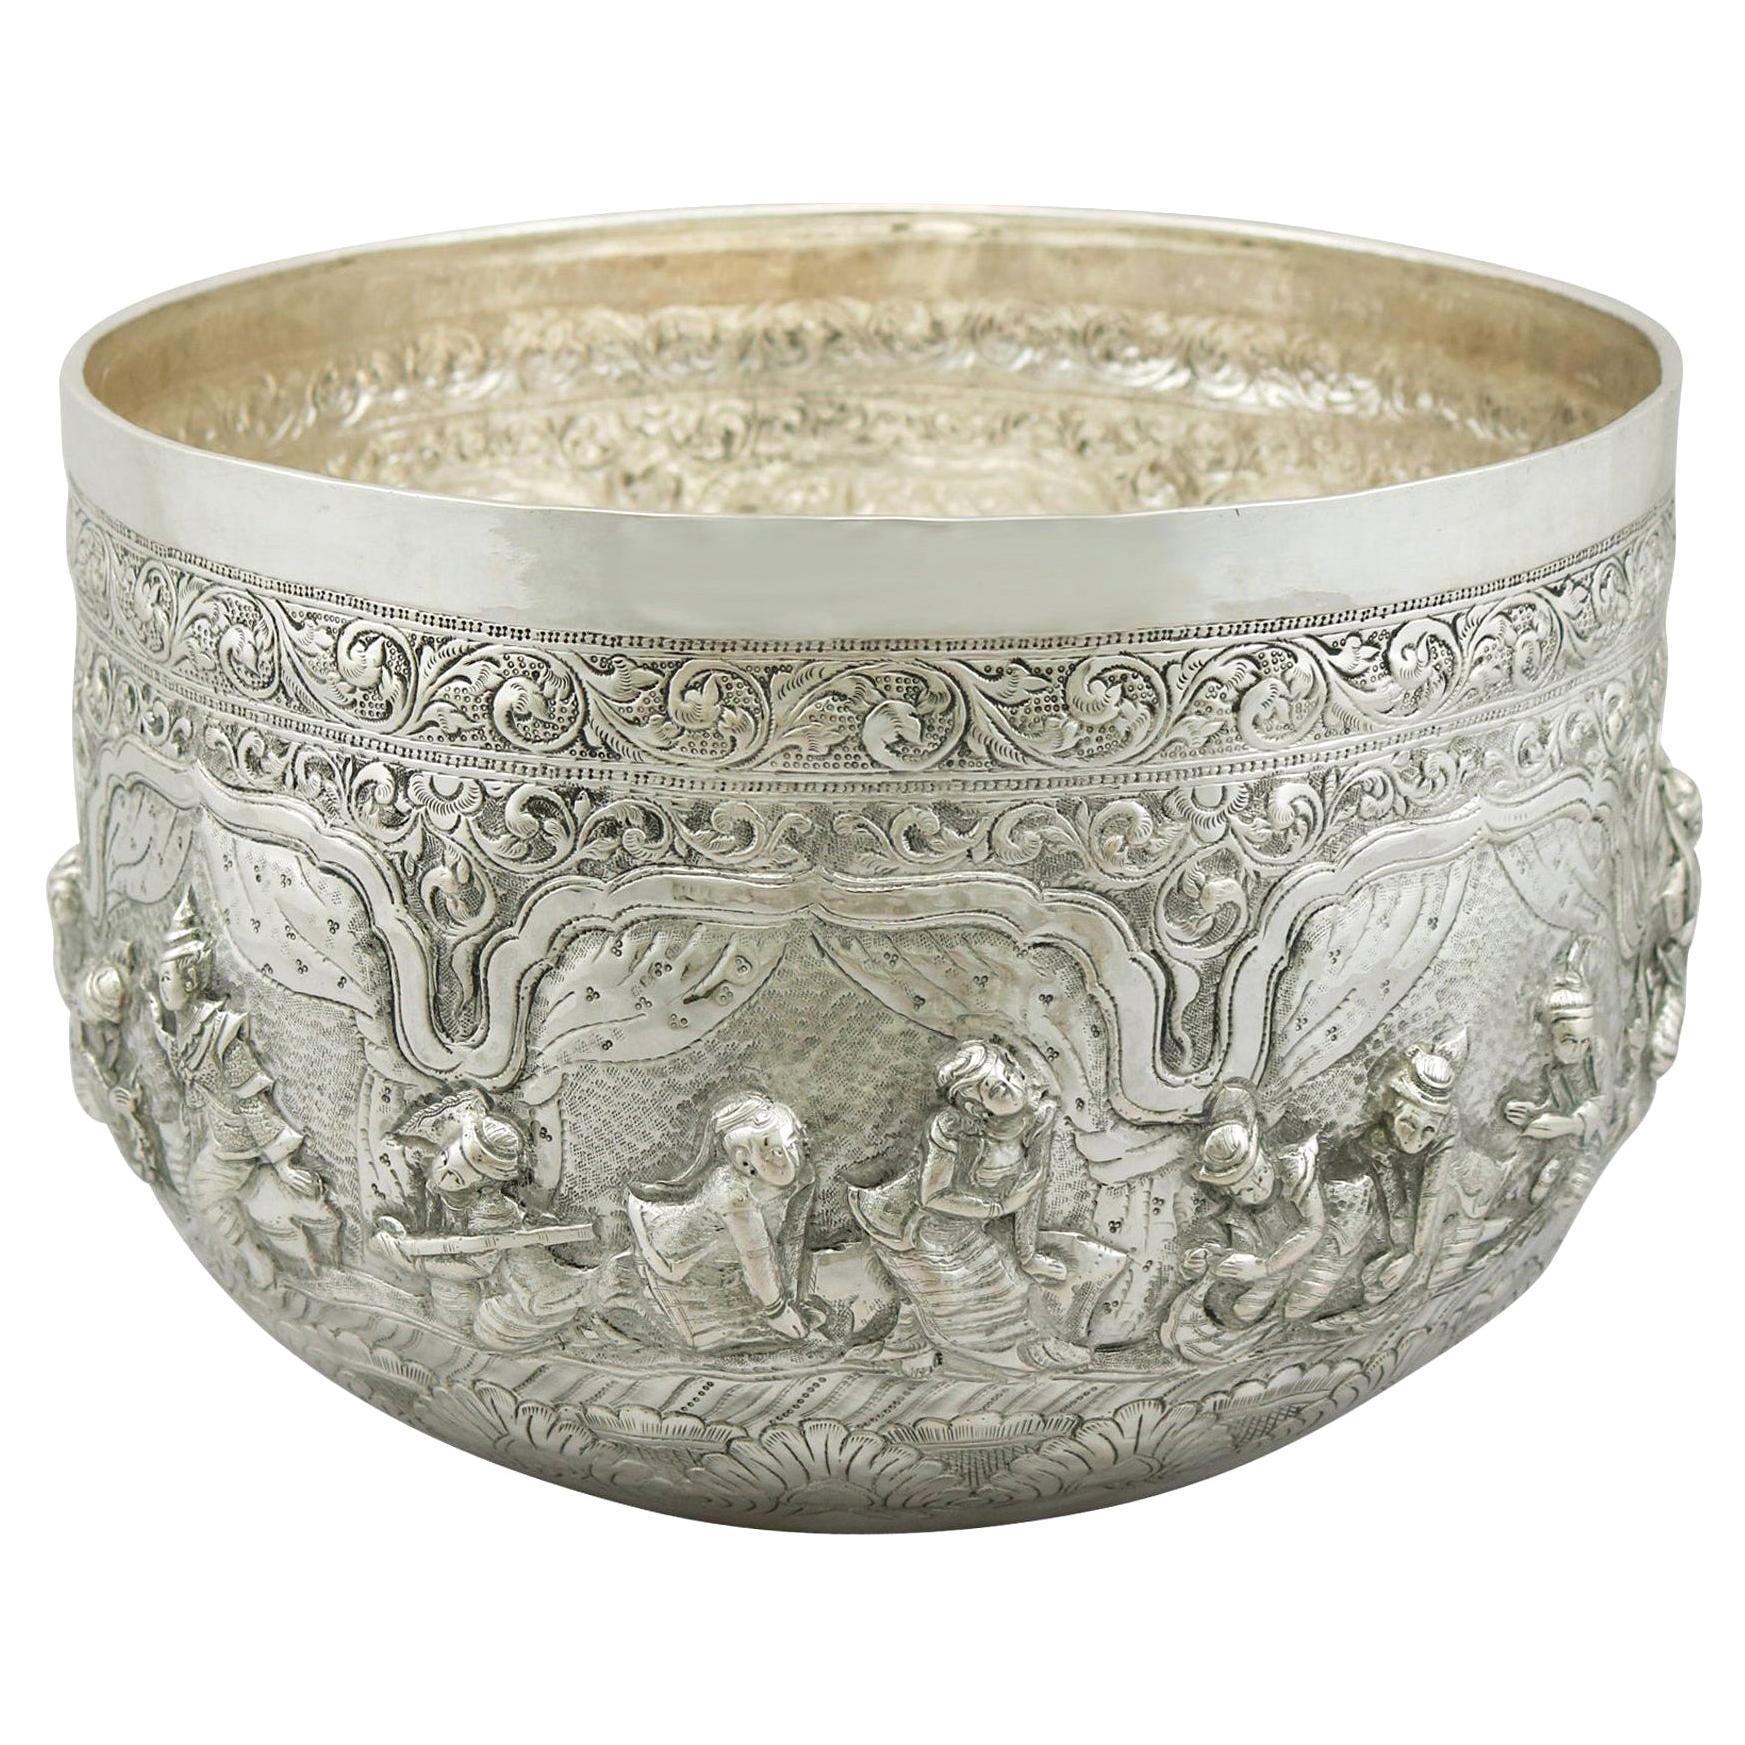 Antique Burmese Silver Thabeik Bowl